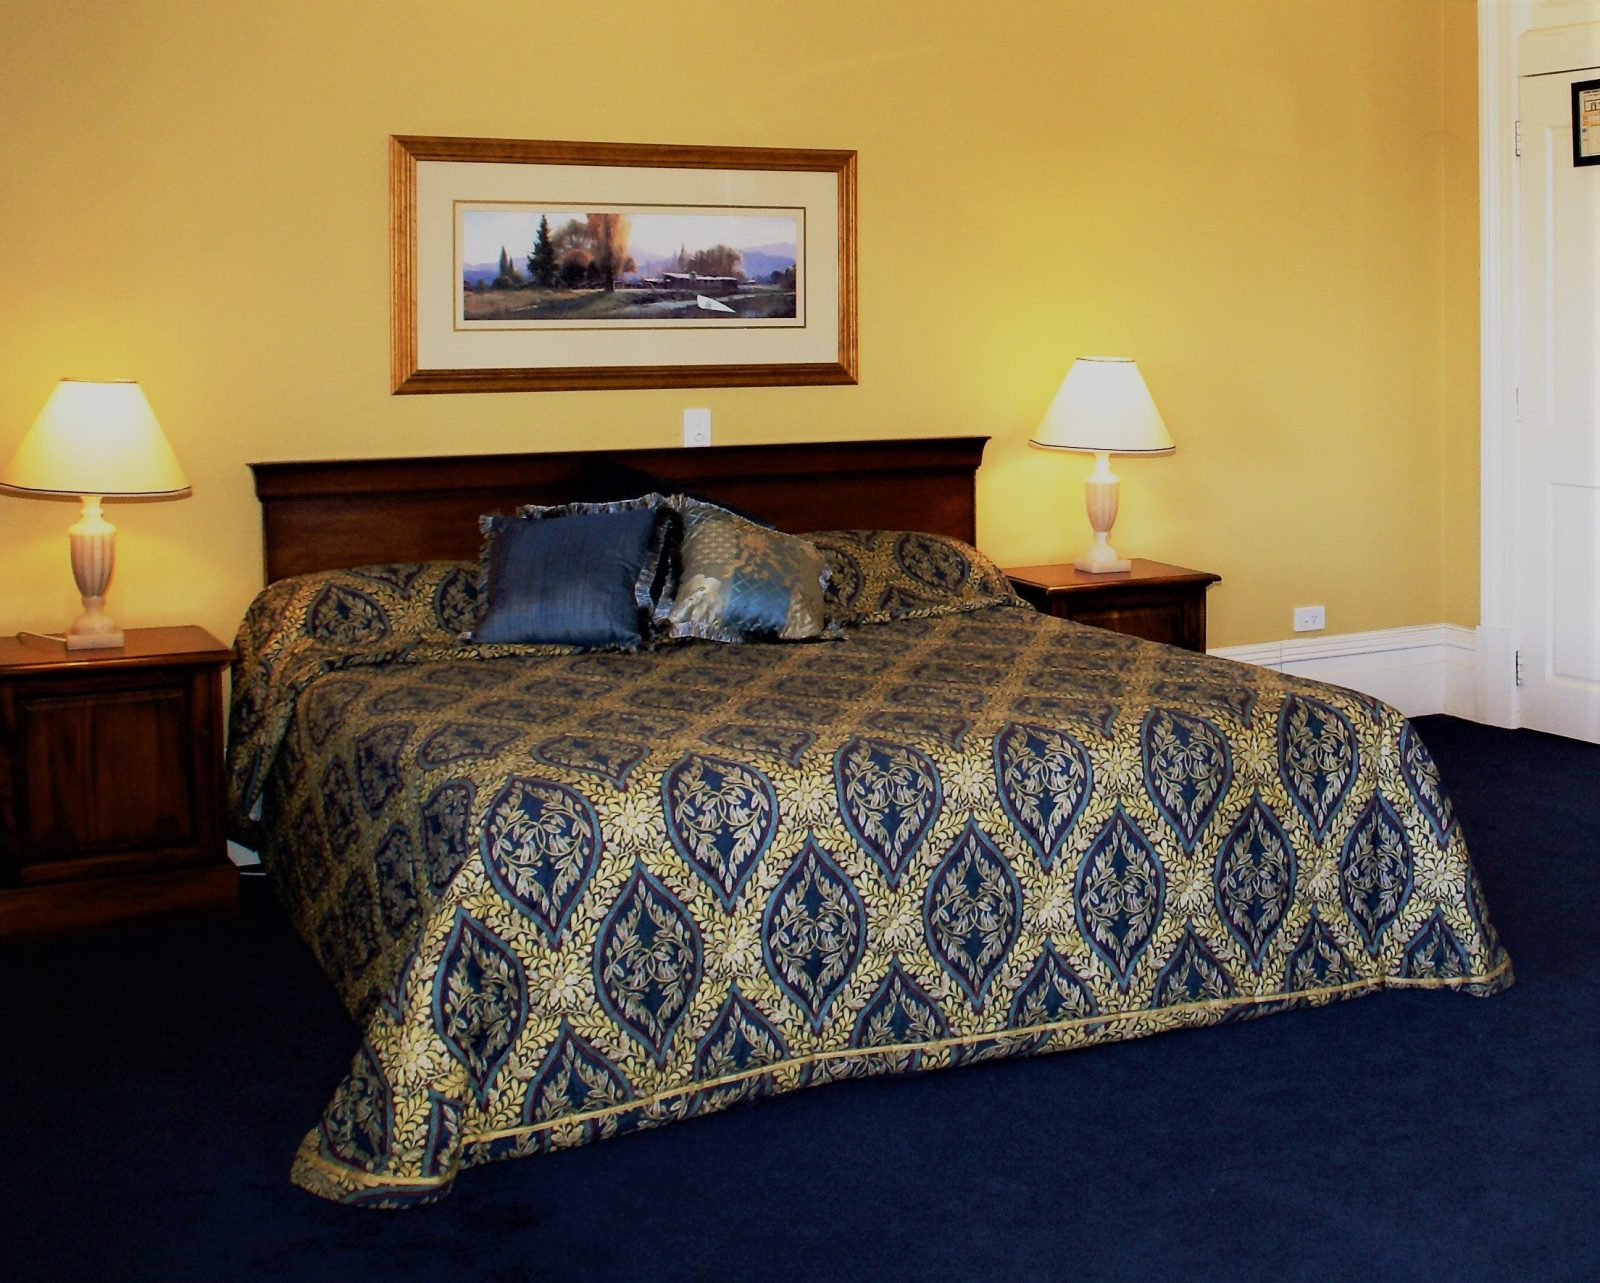 York Palace Hotel, York, Western Australia